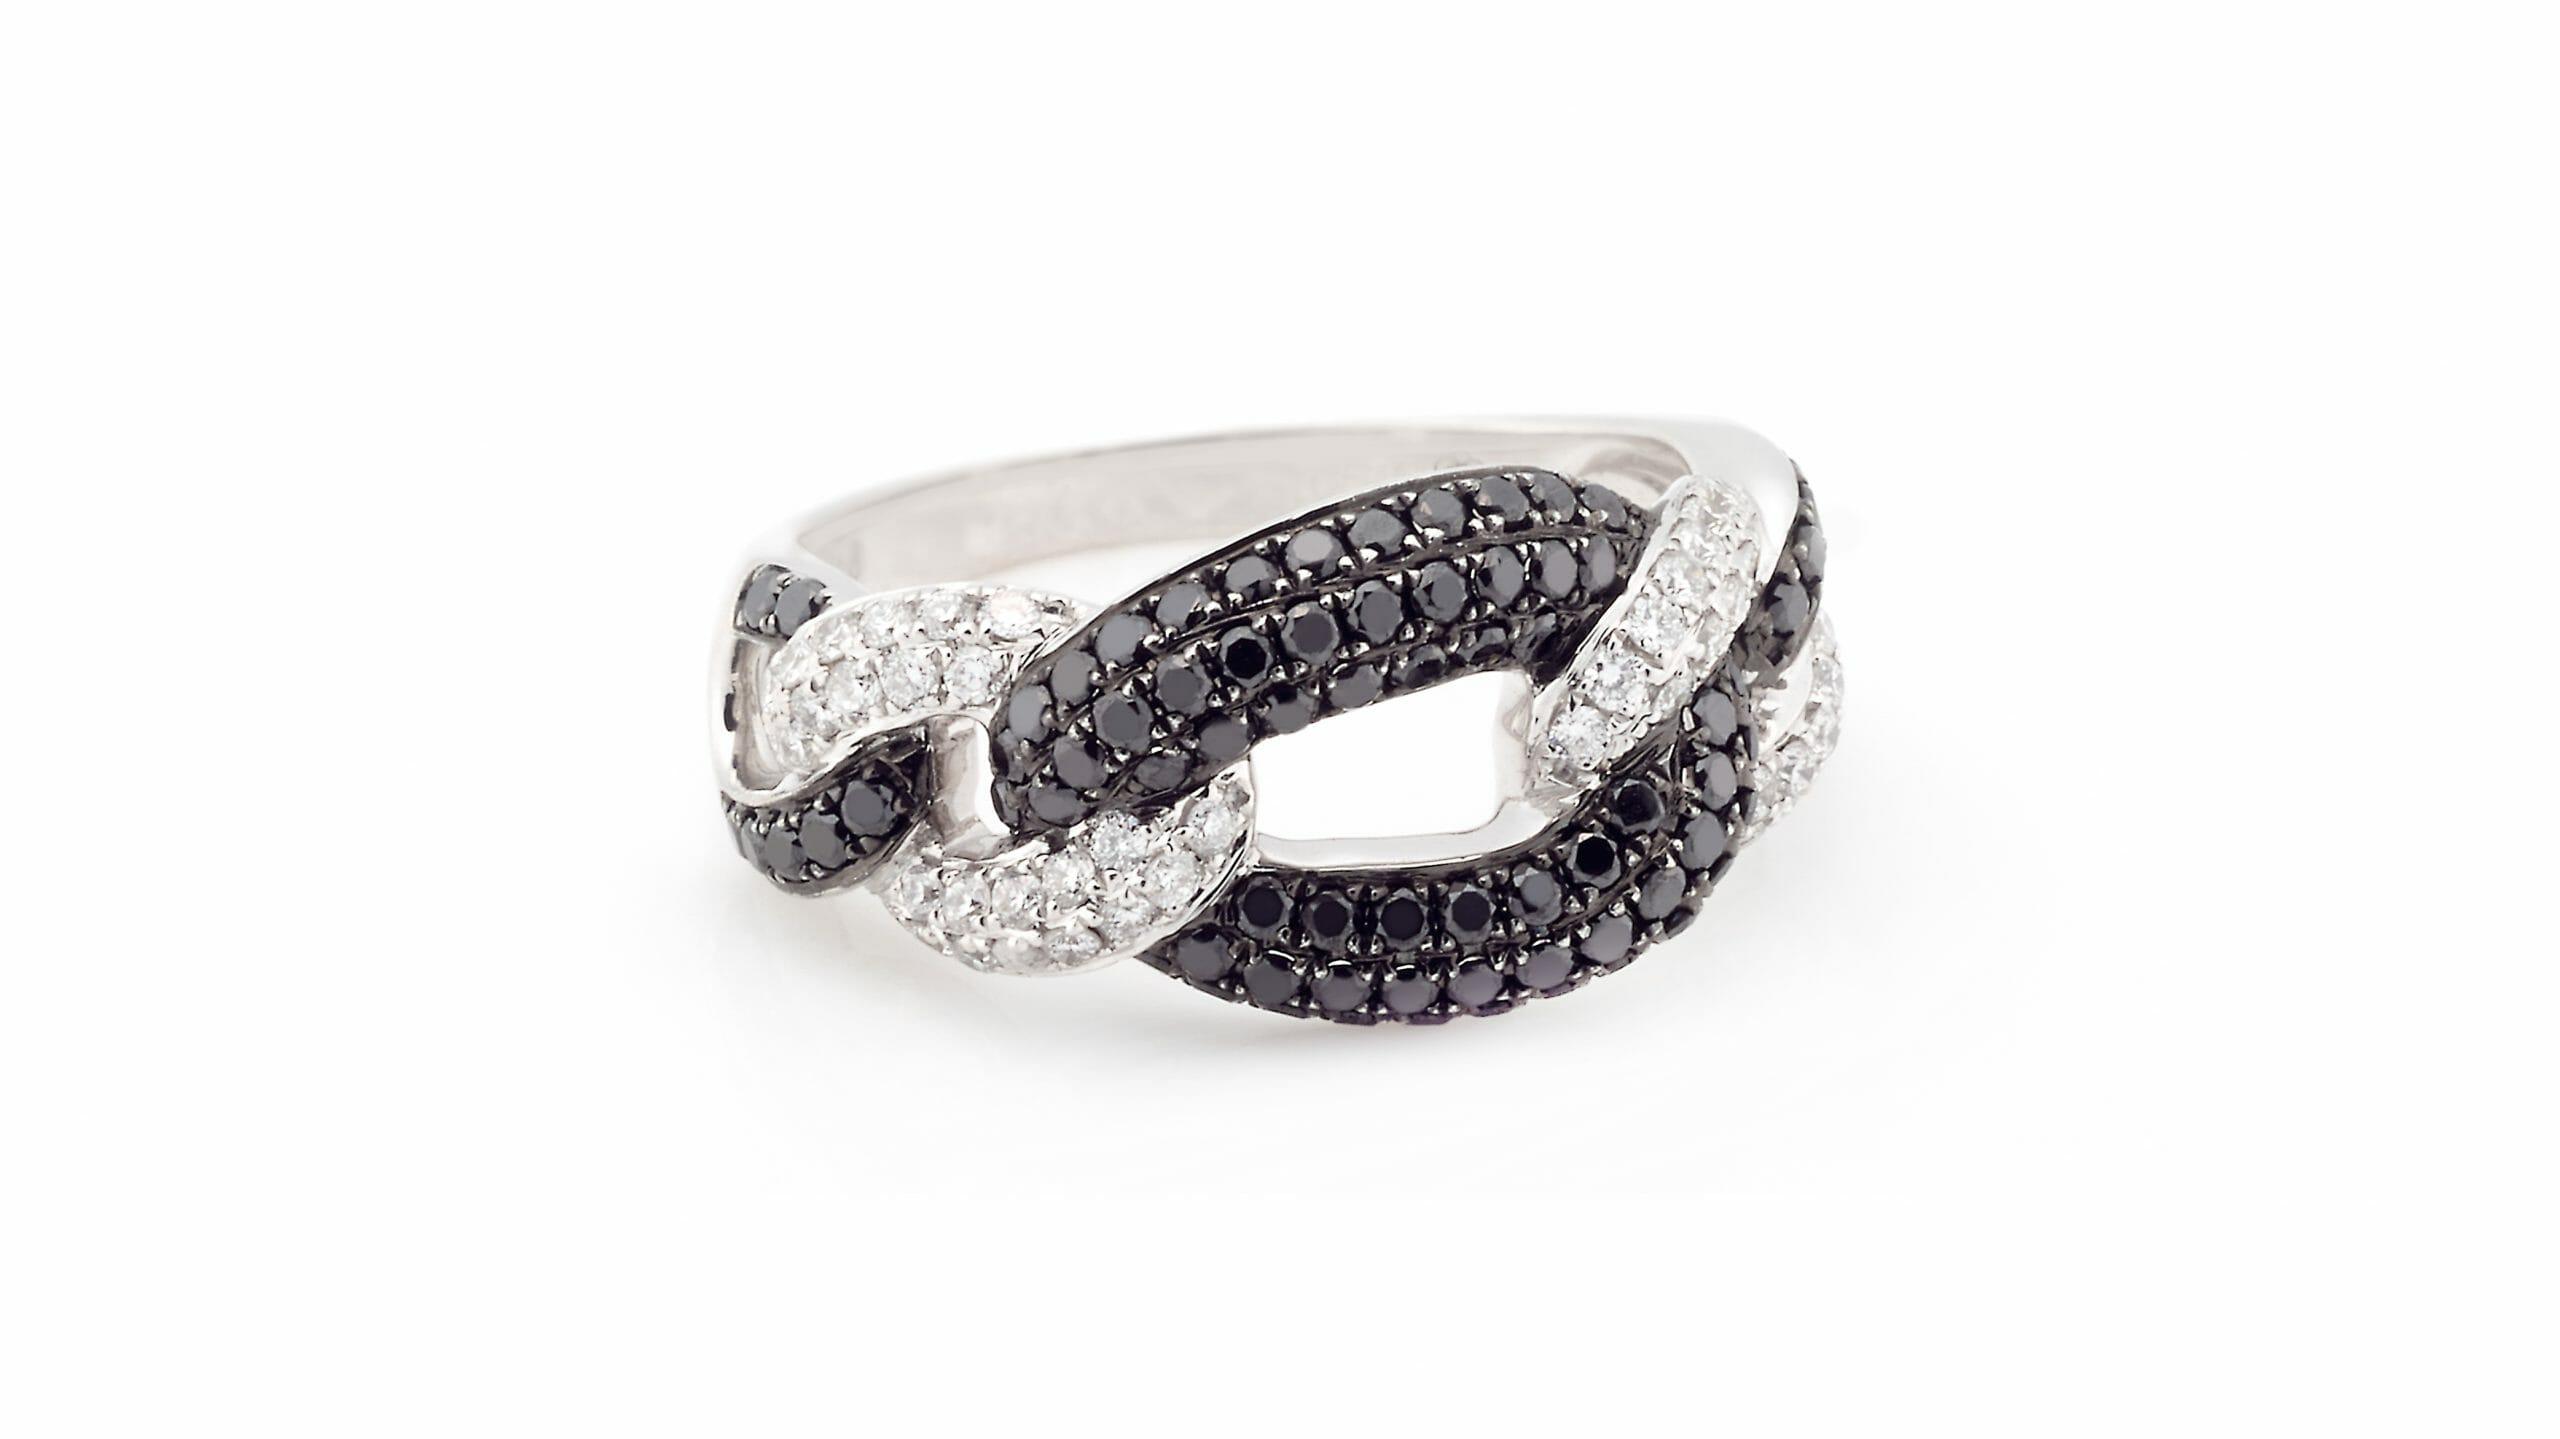 Black & White Diamond Fancy-Link Dress Ring | 18 Carat White Gold Fancy-Link Ring With White & Black Diamonds